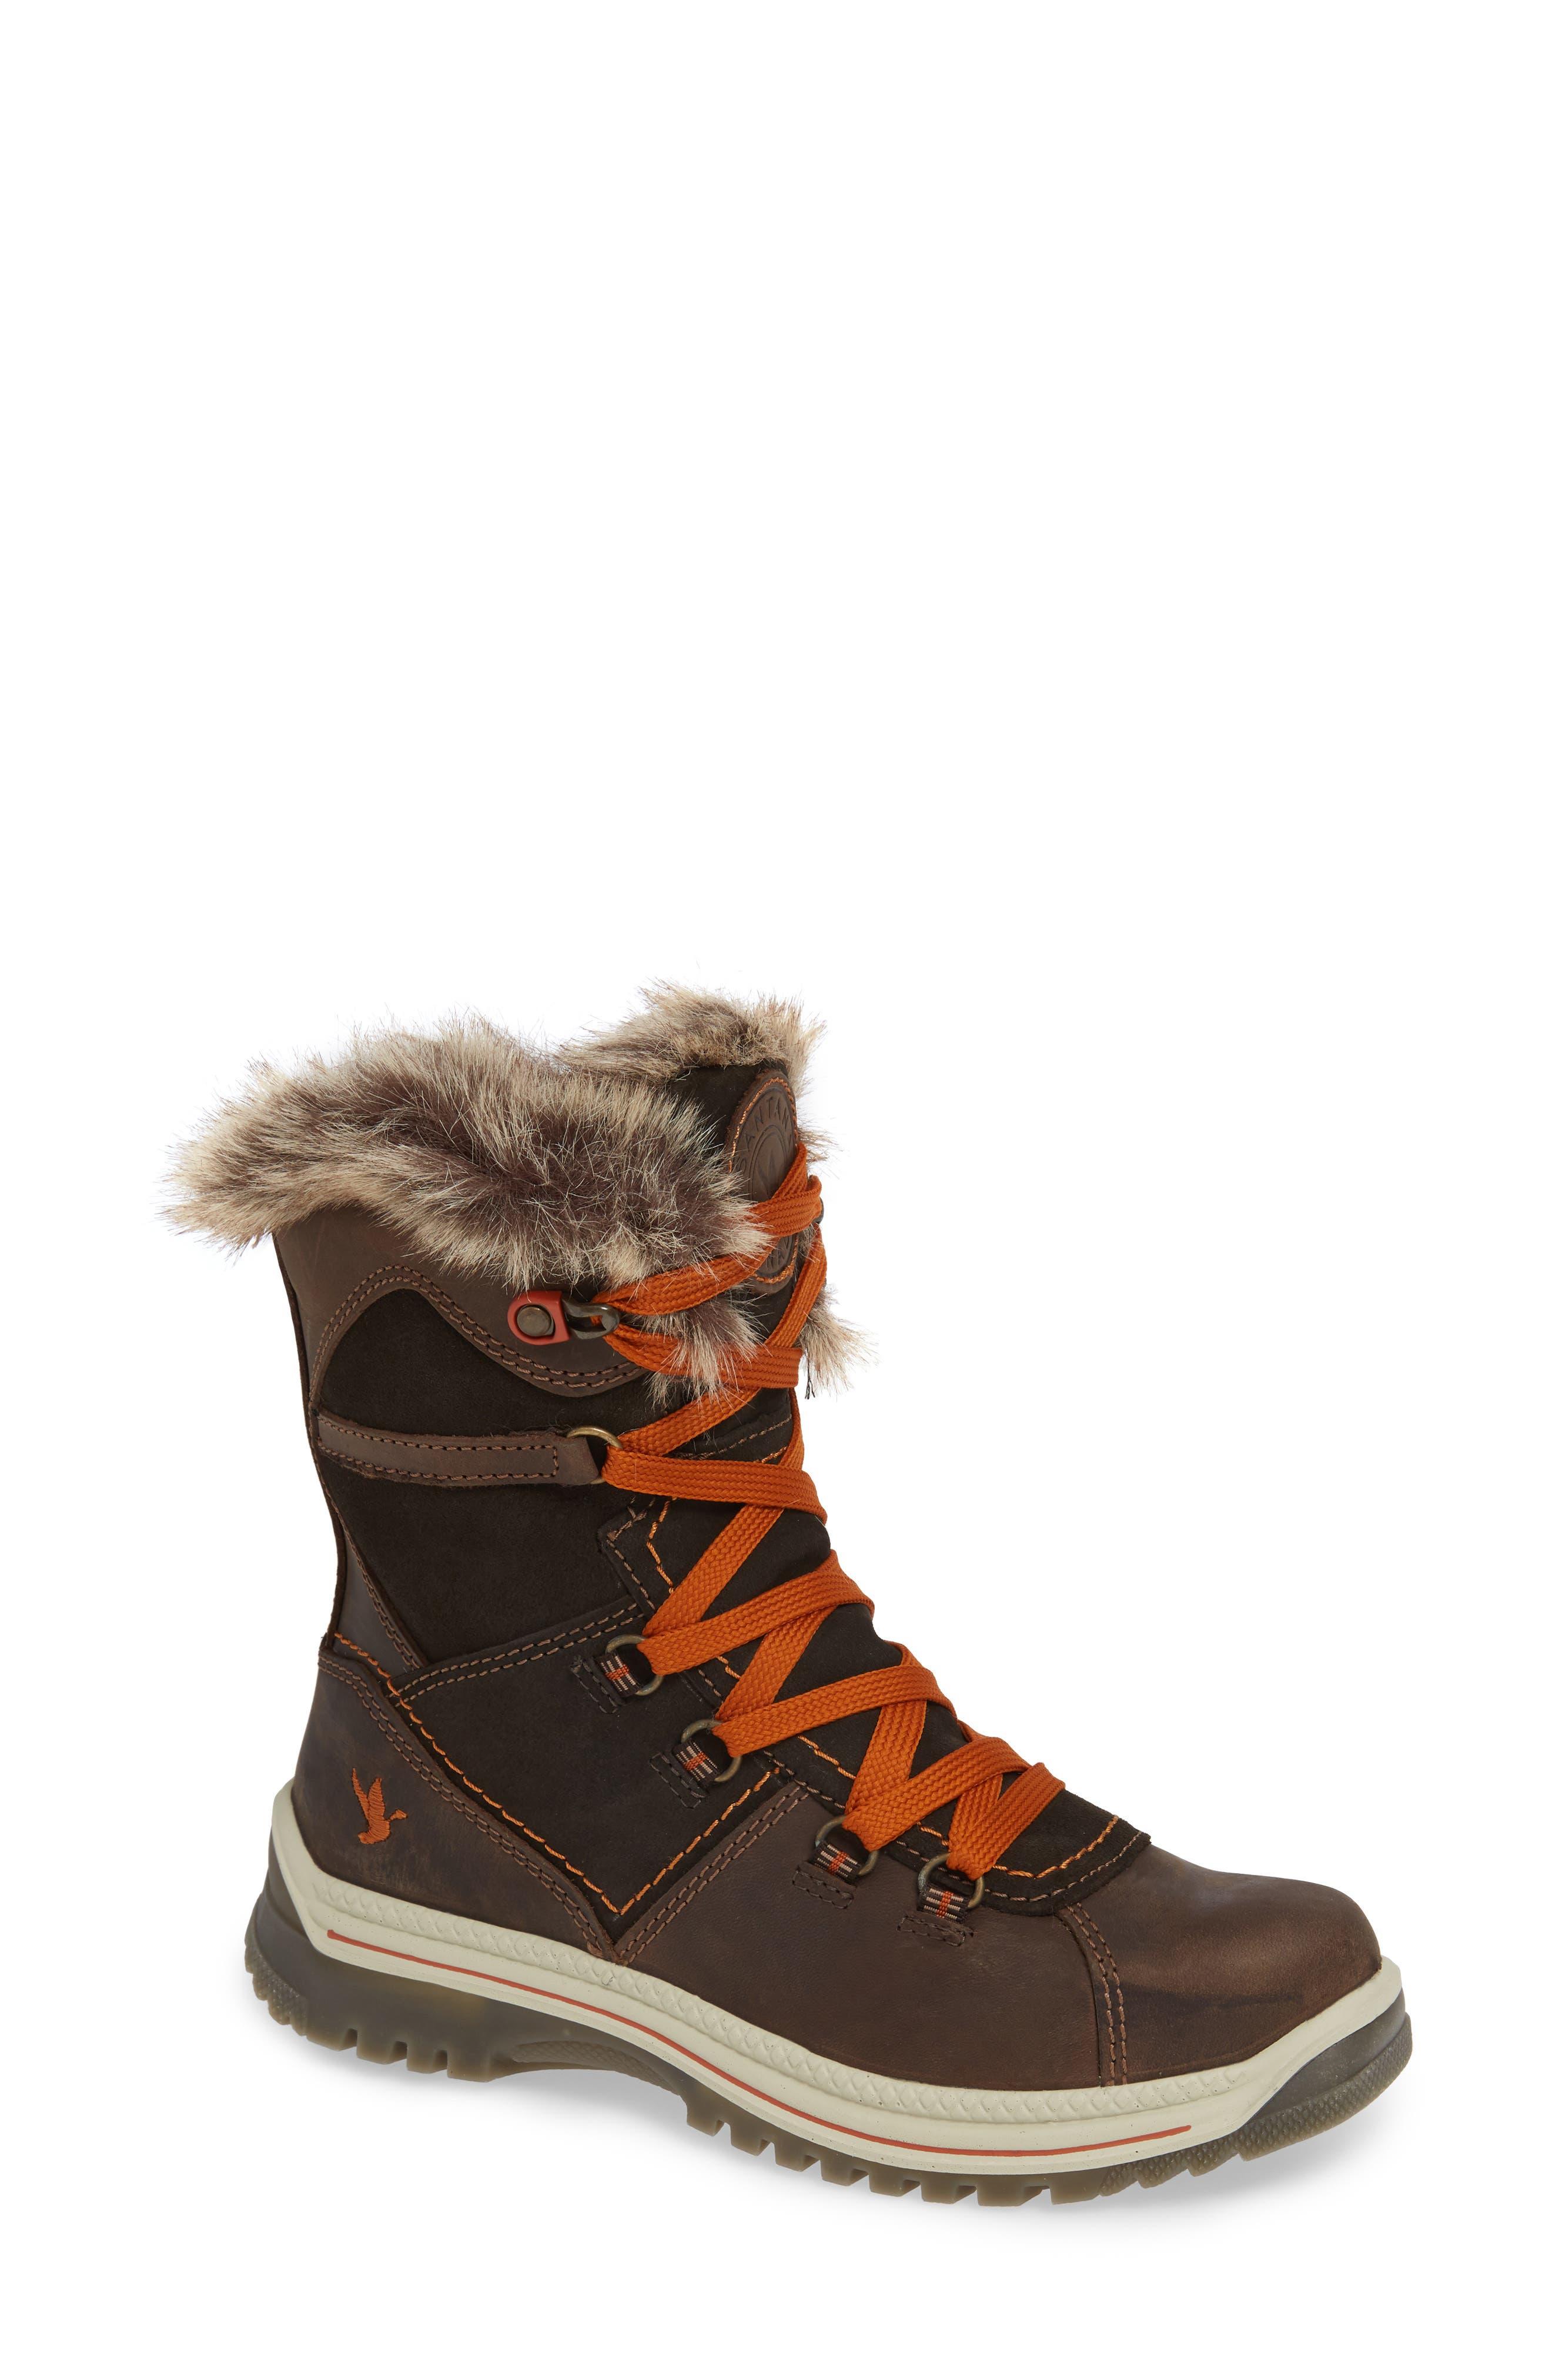 c7820ad5424 Women s Santana Canada Boots